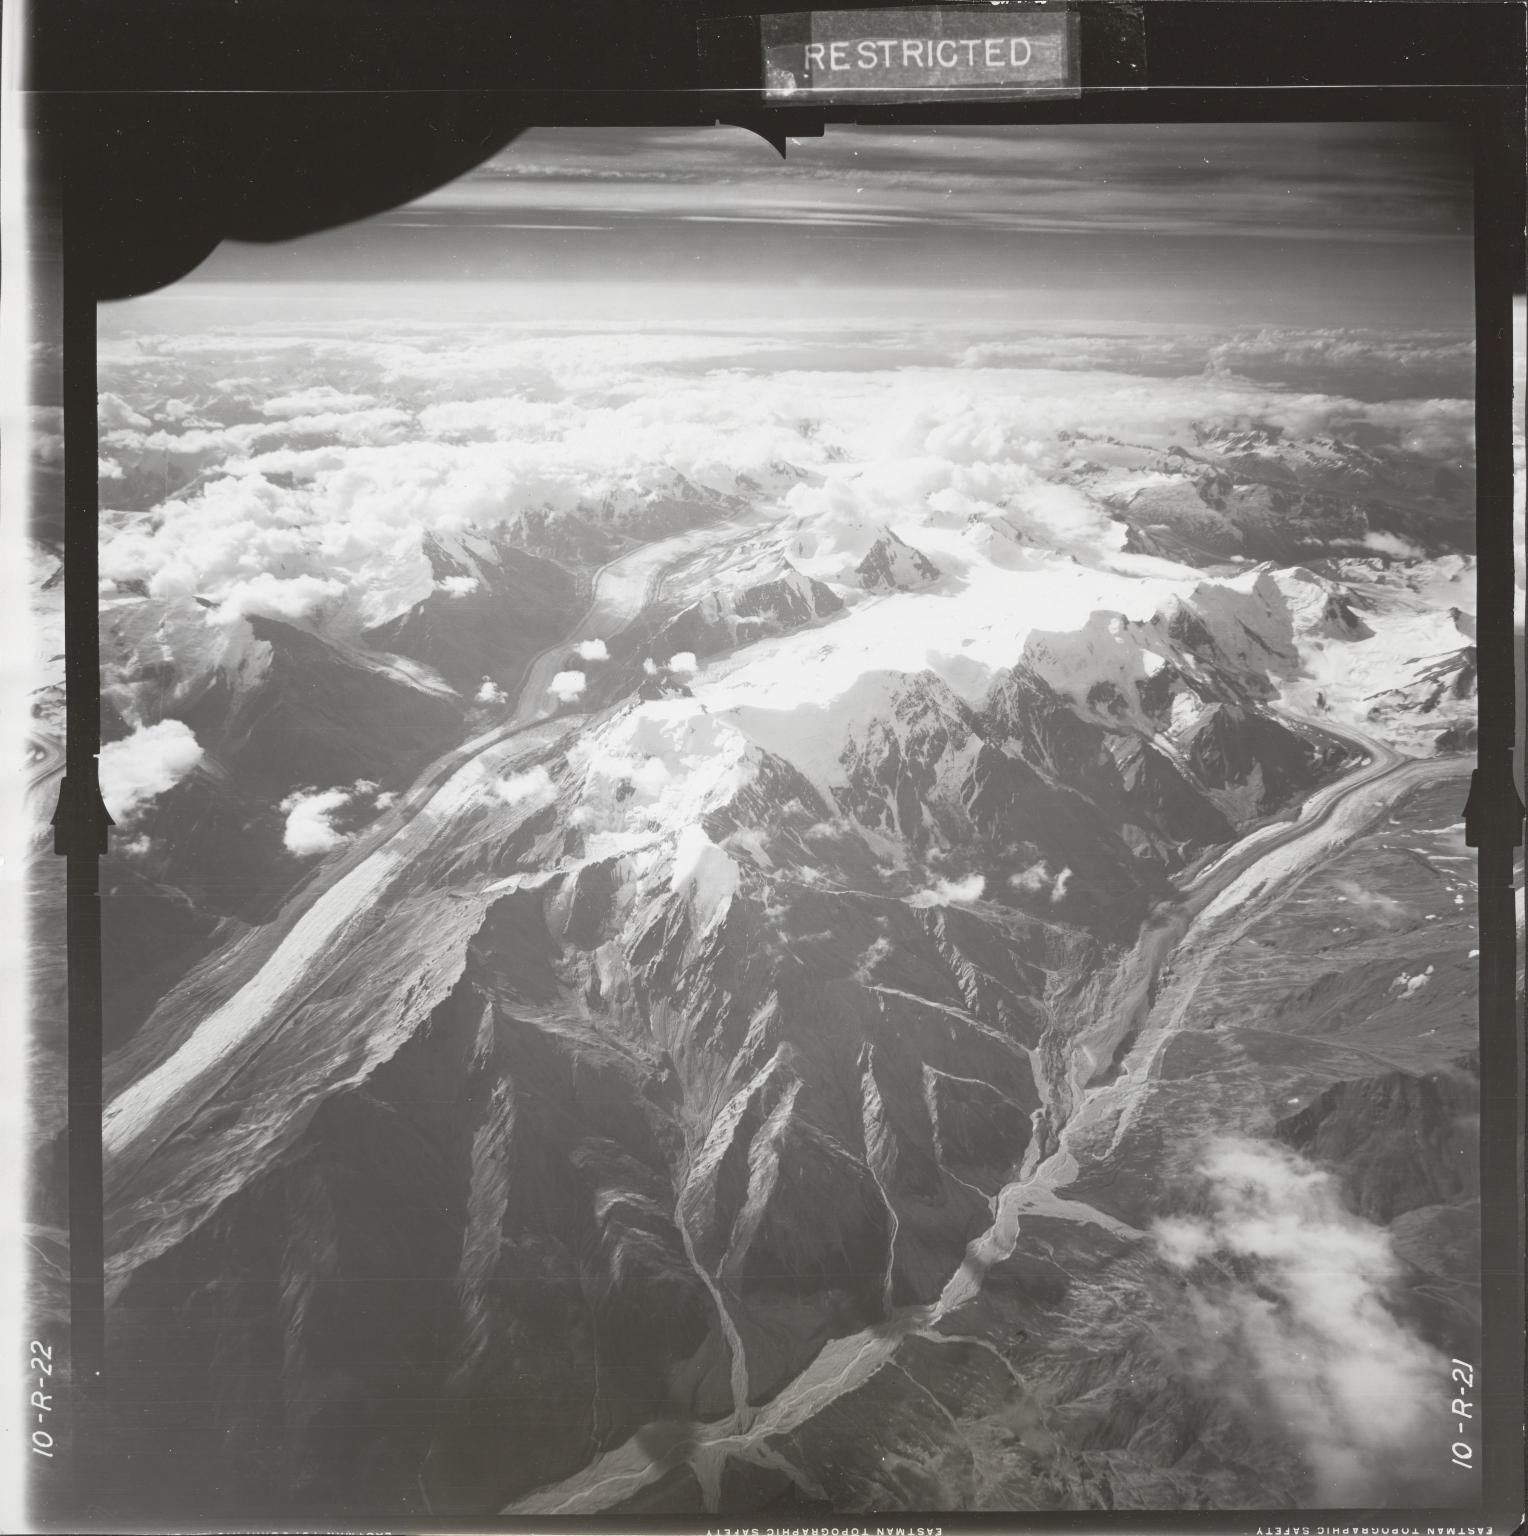 At head of Gerstle River, aerial photograph FL 18 R-21, Alaska